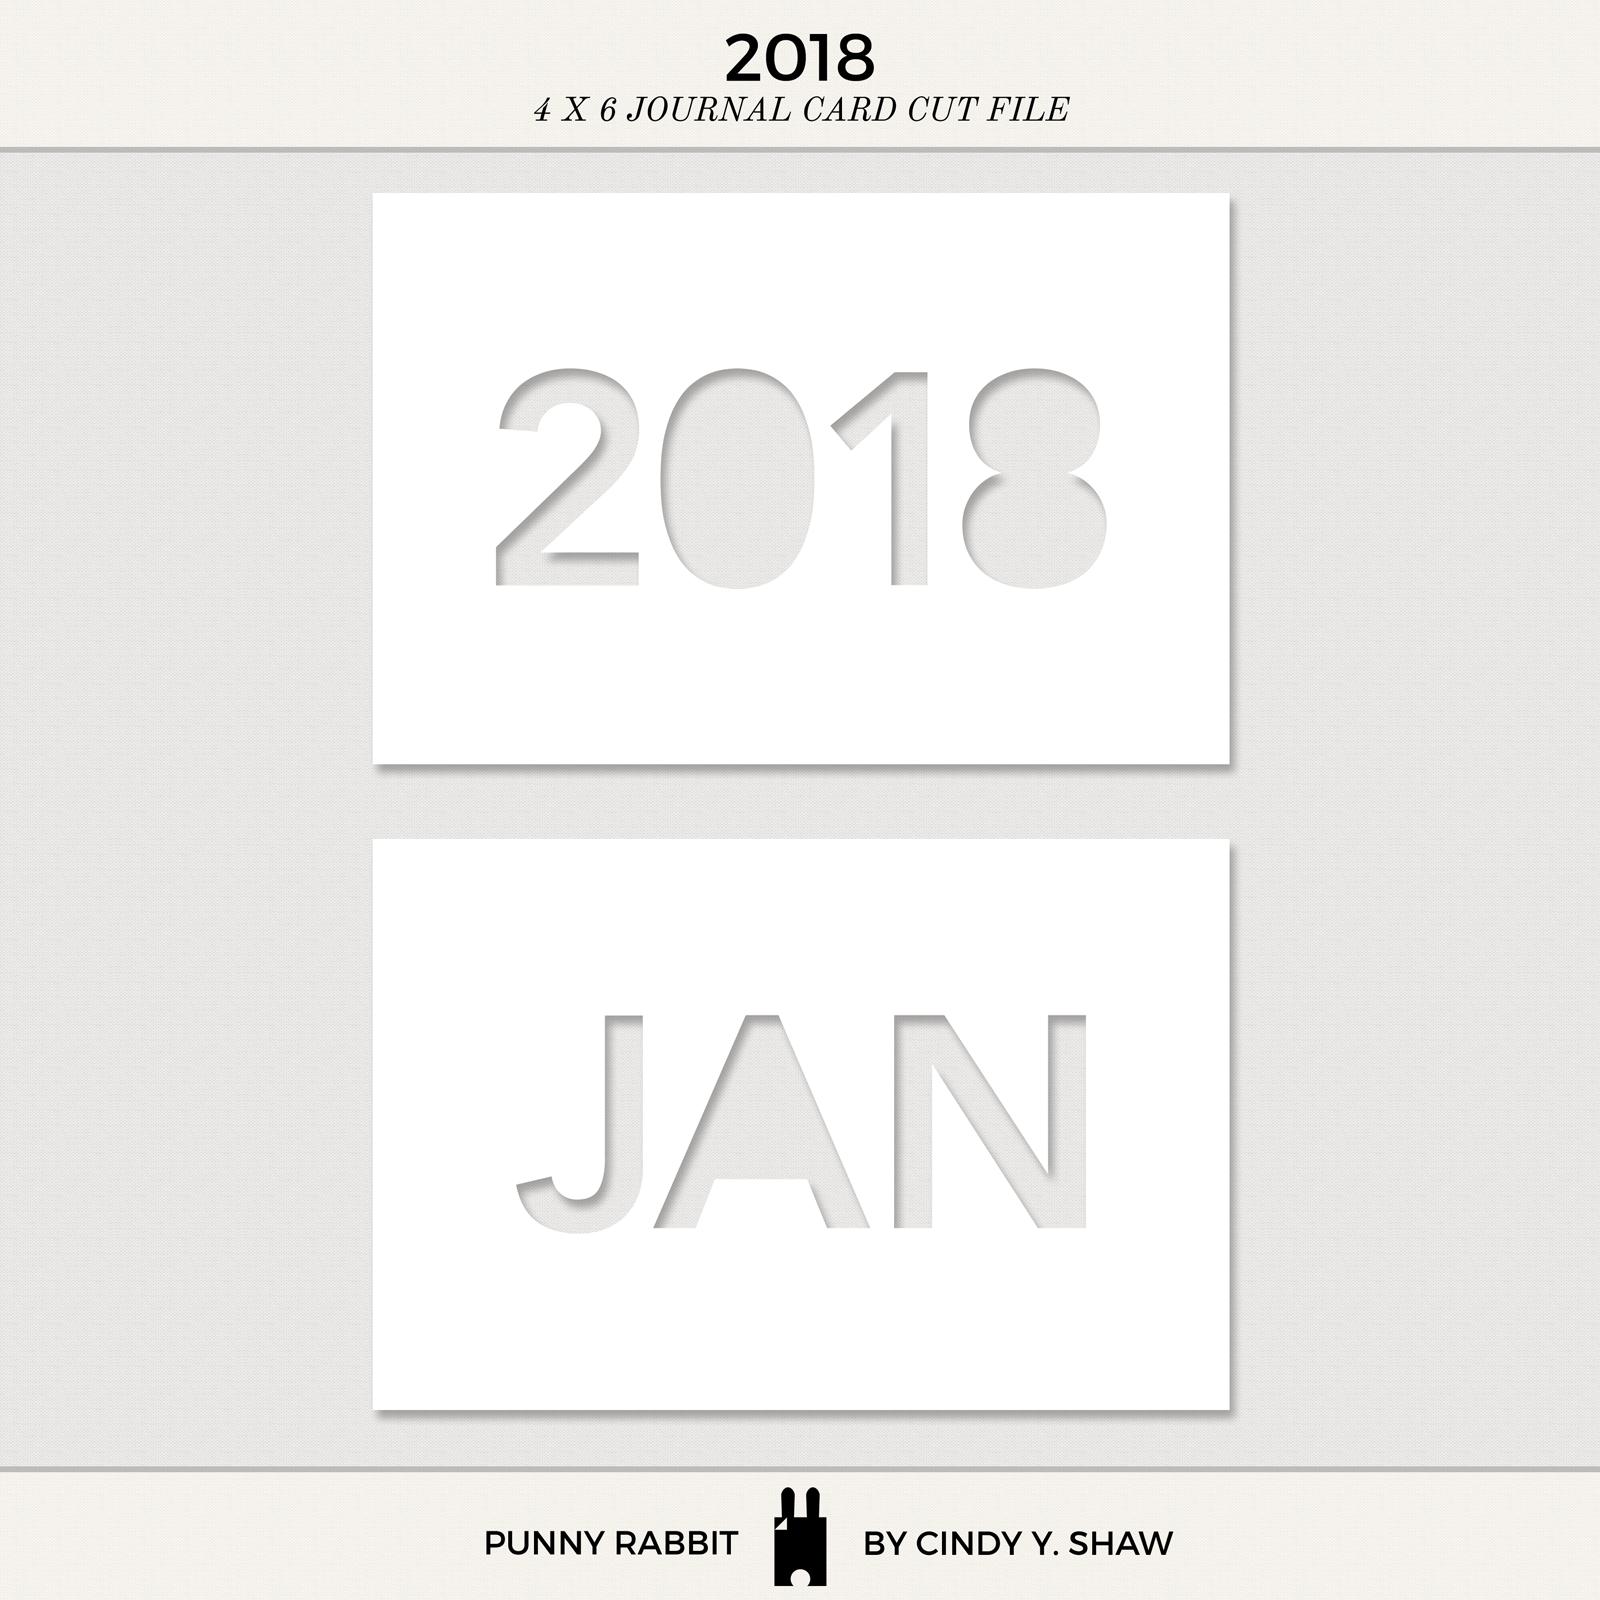 2018 die cut file cricut silhouette freebie overlay